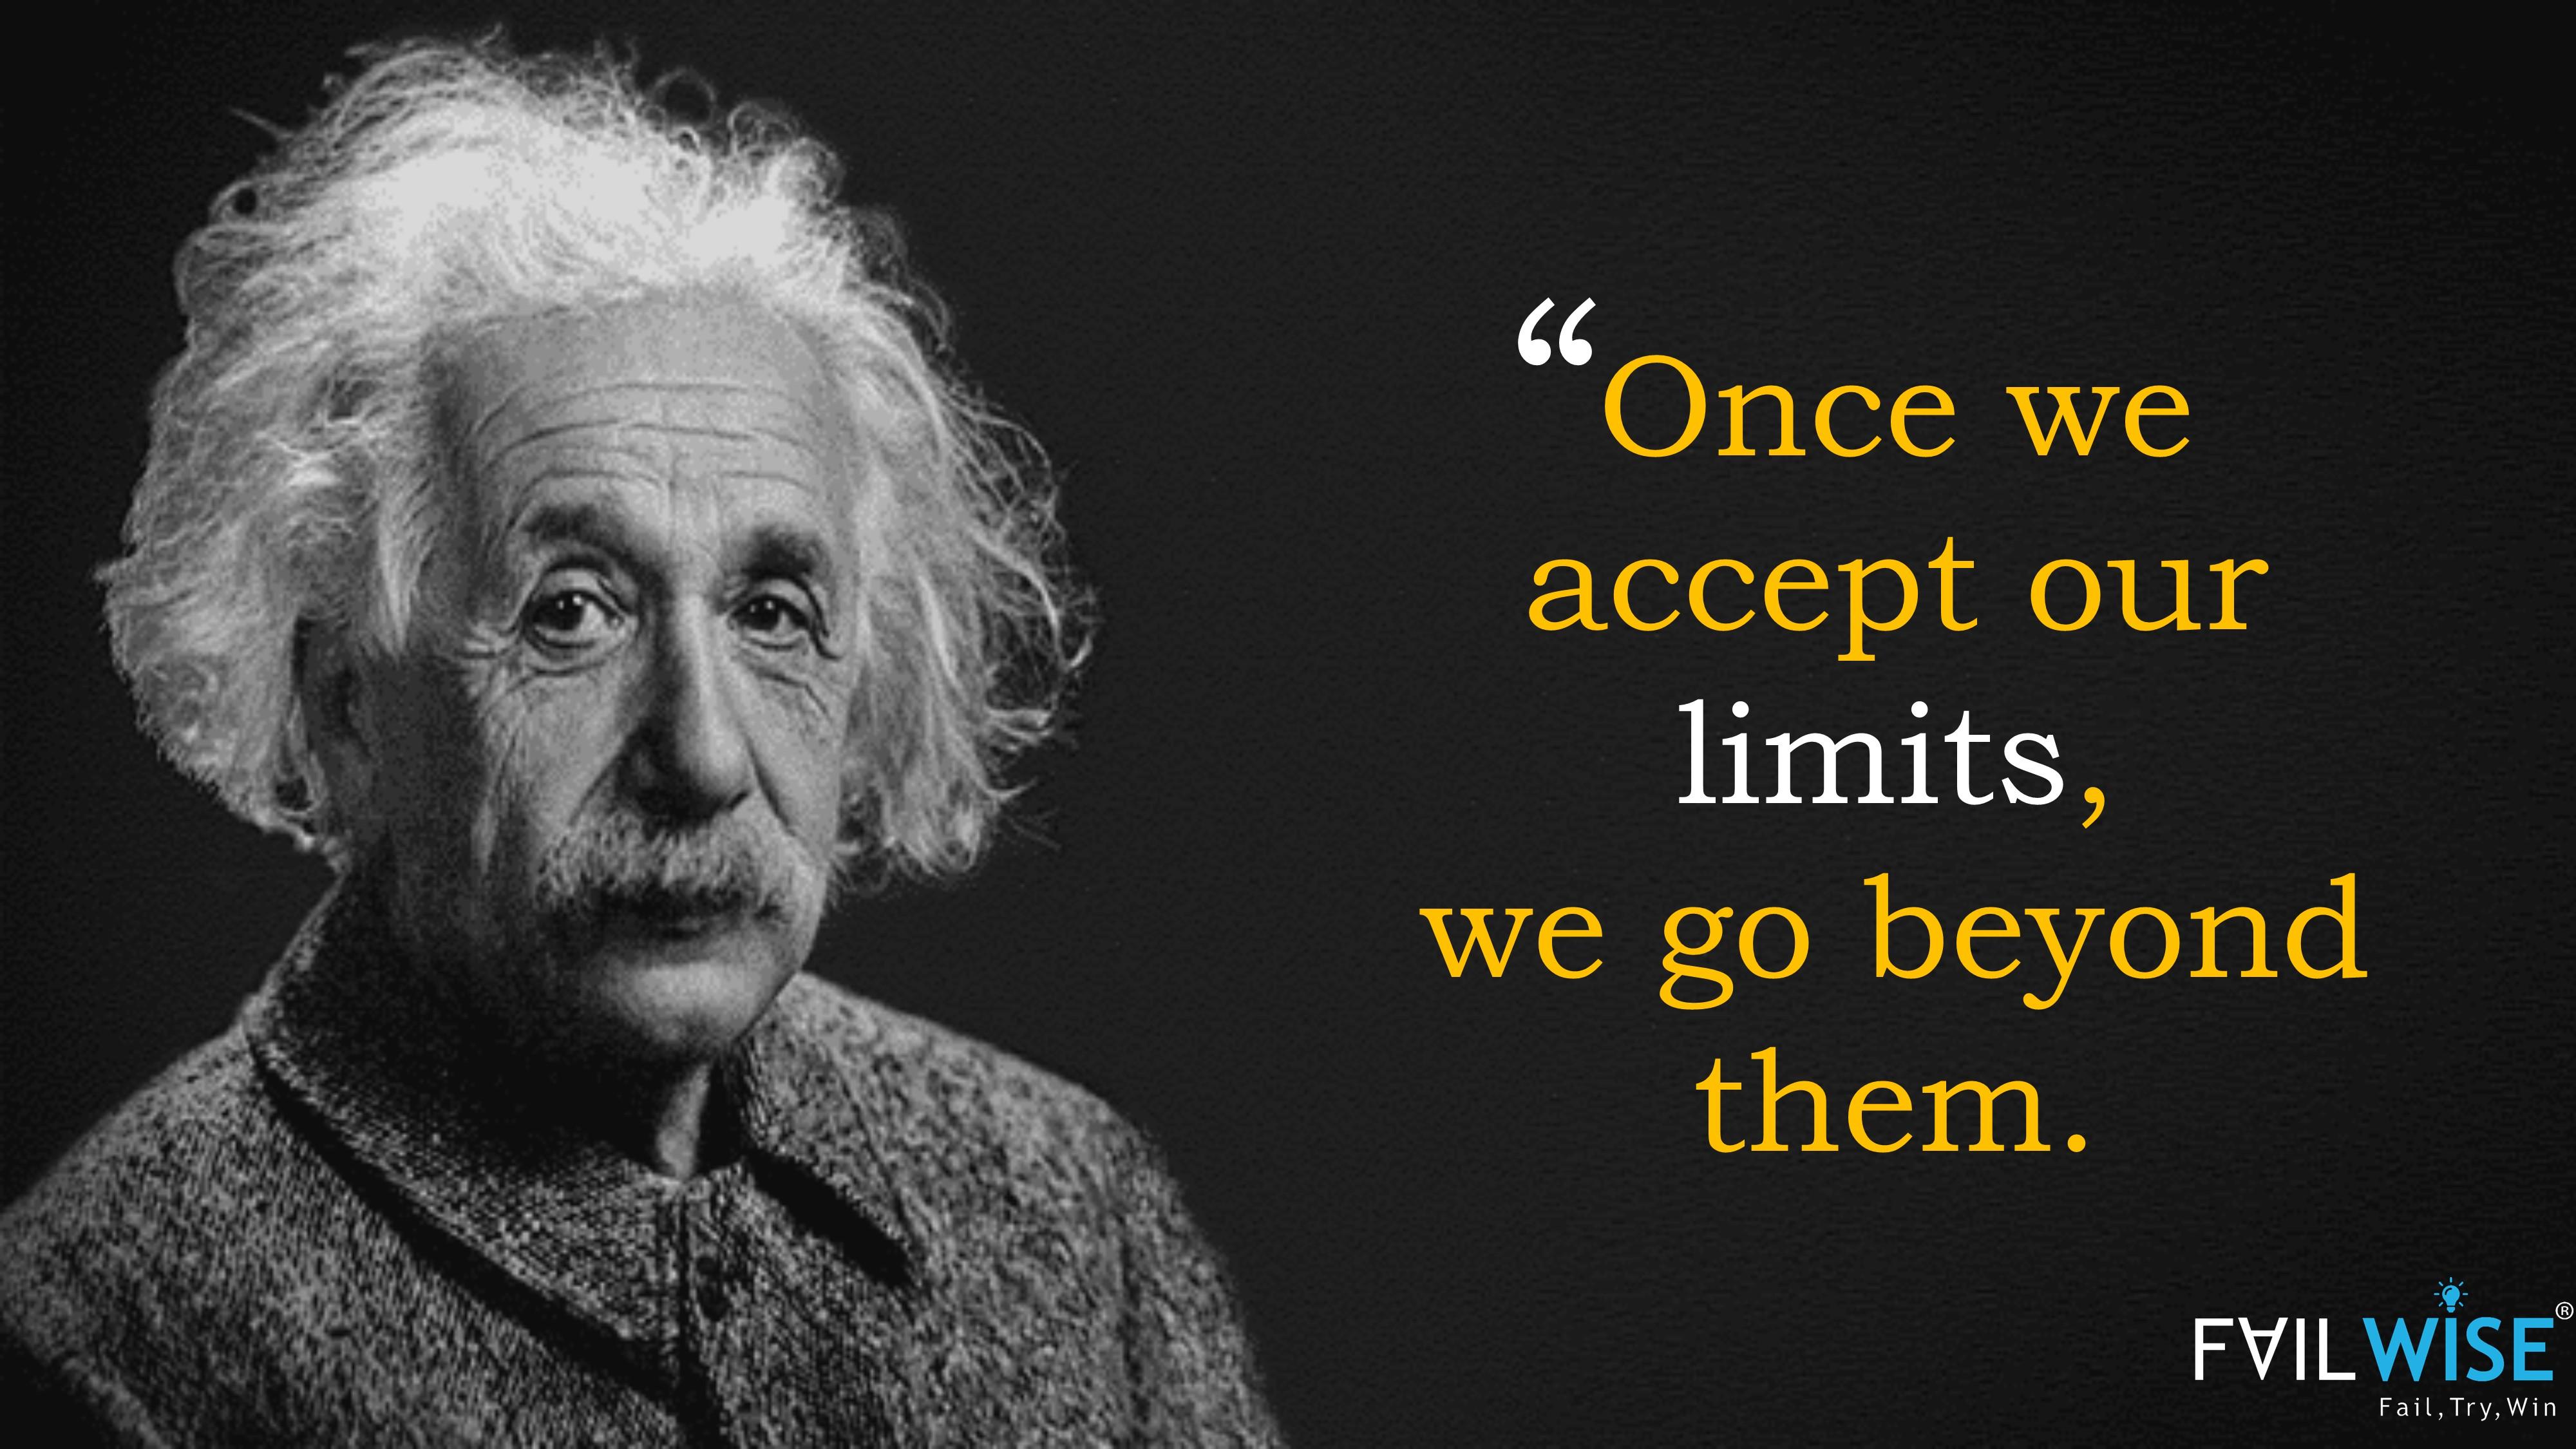 Albert Einstein – The Iconic Man Behind Massive Struggles and Failures